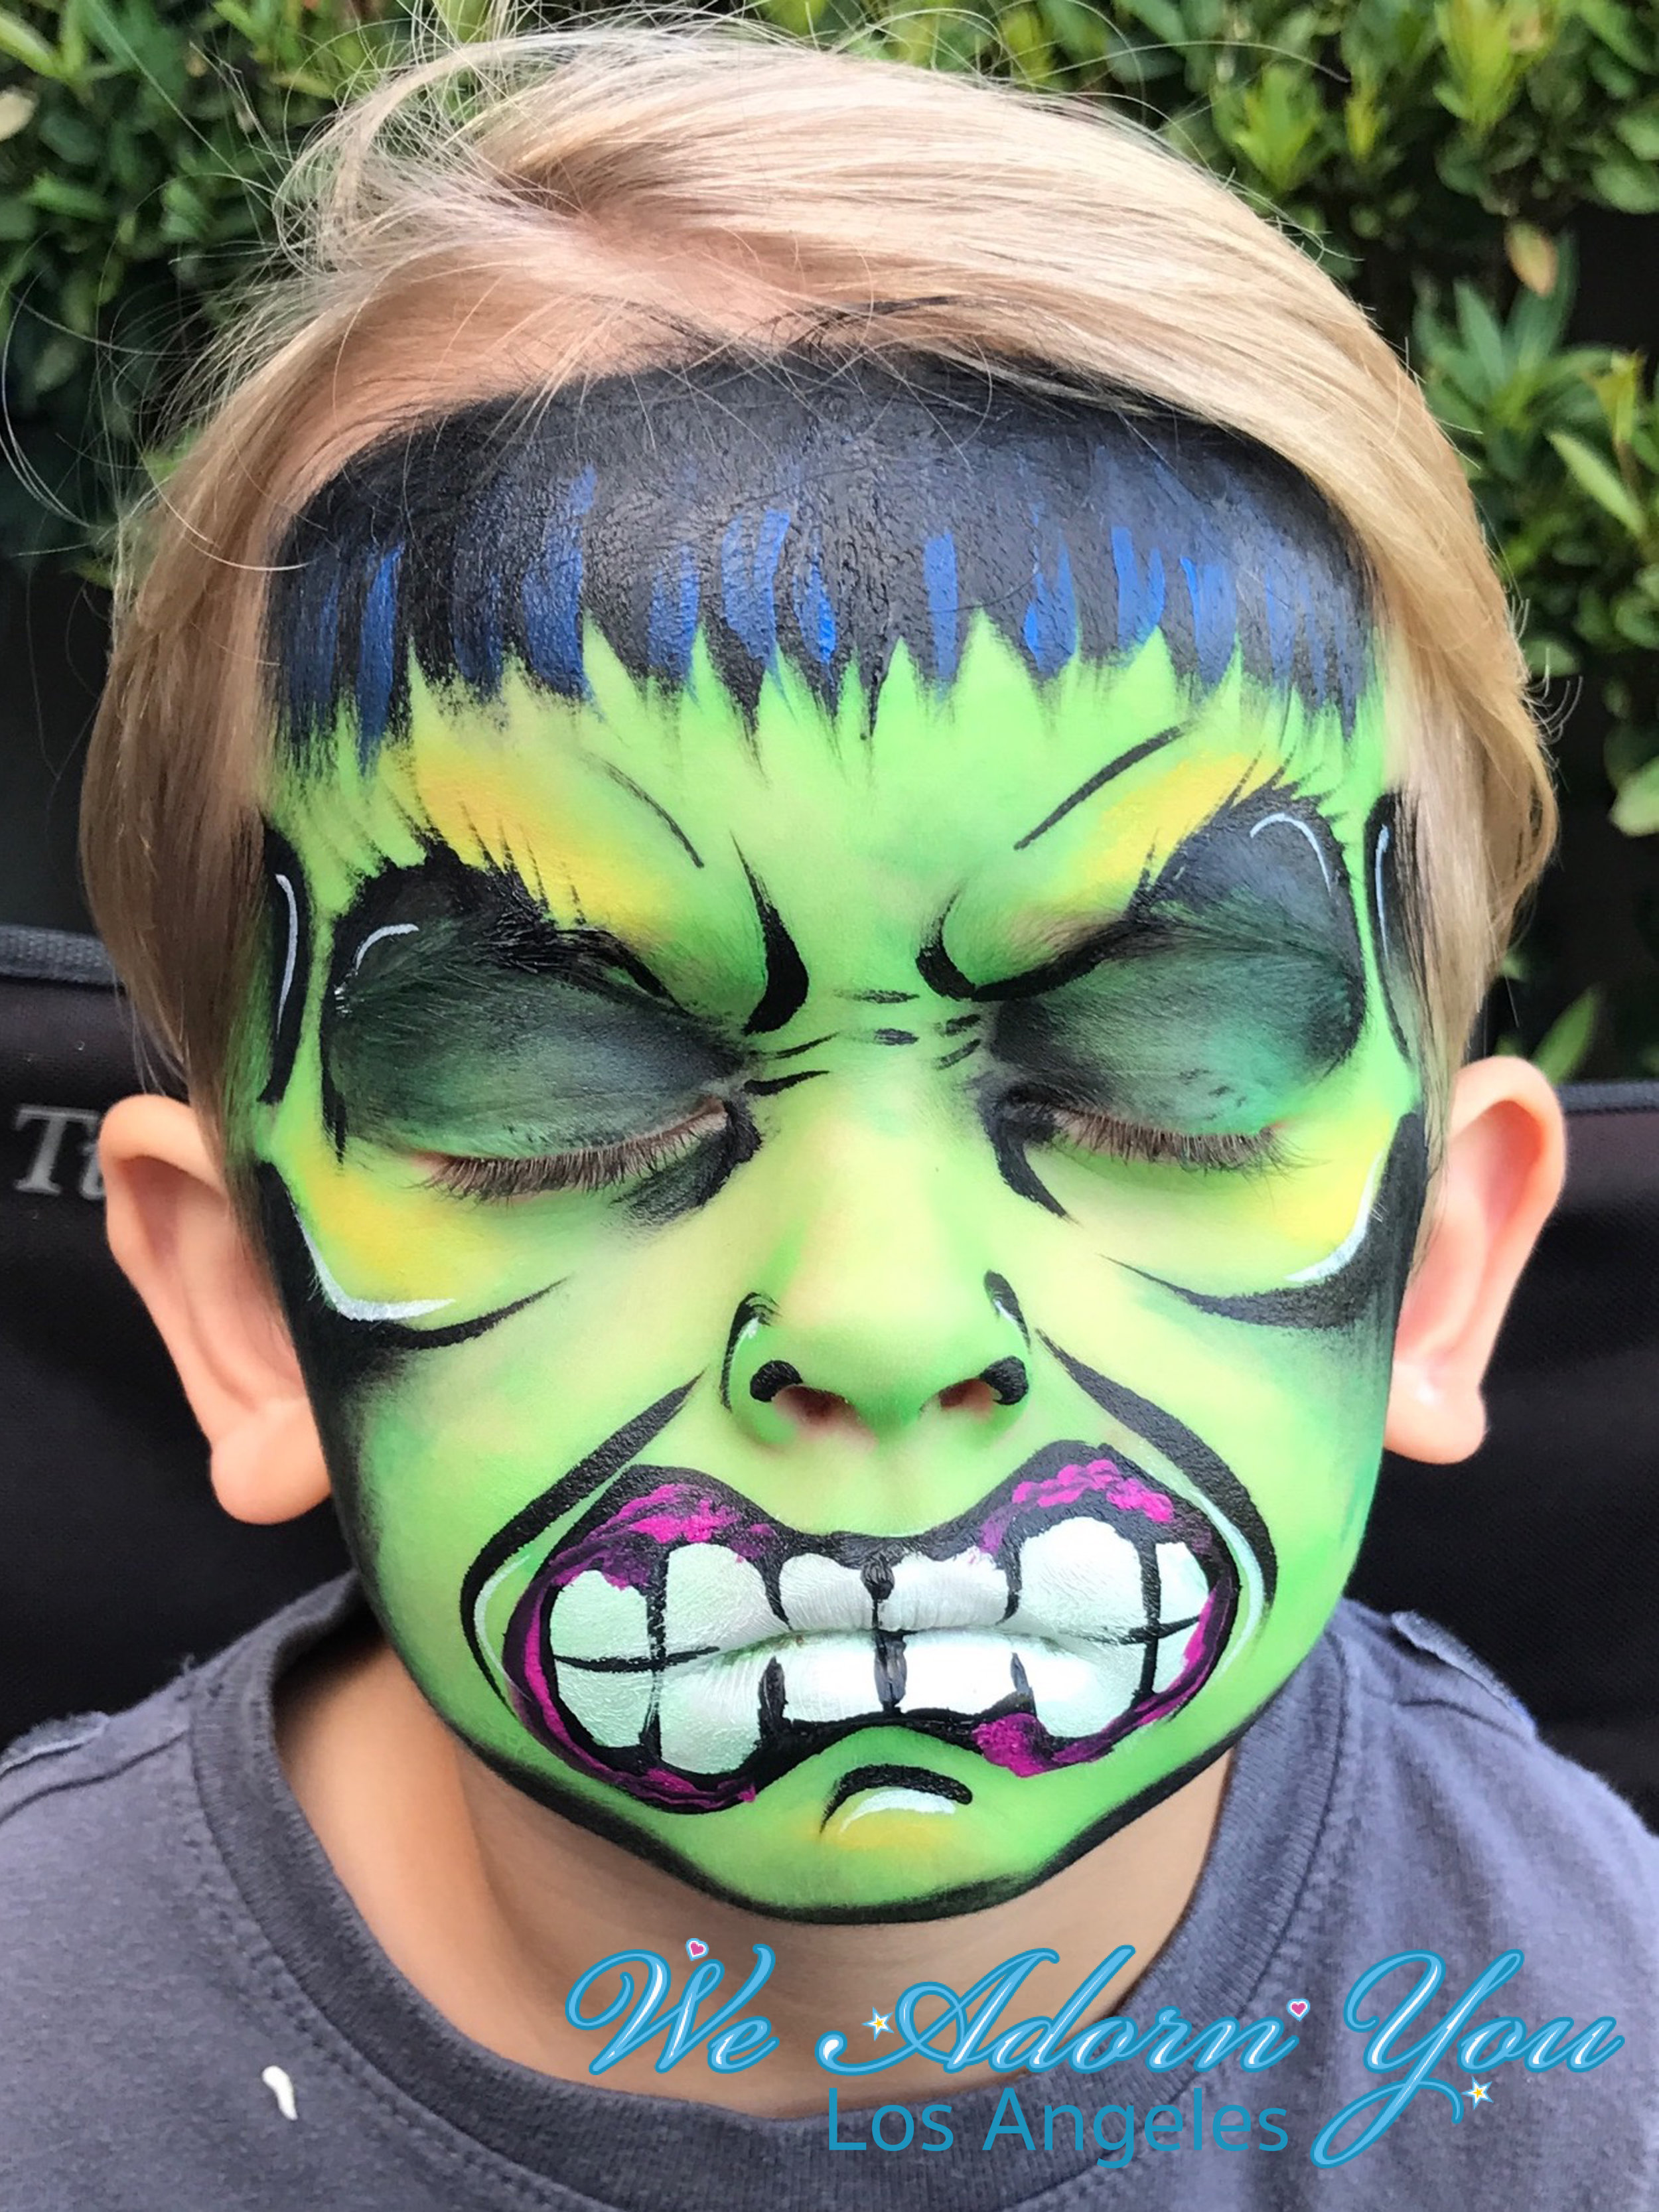 We Adorn You Los Angeles Face Painitng Hulk.jpg